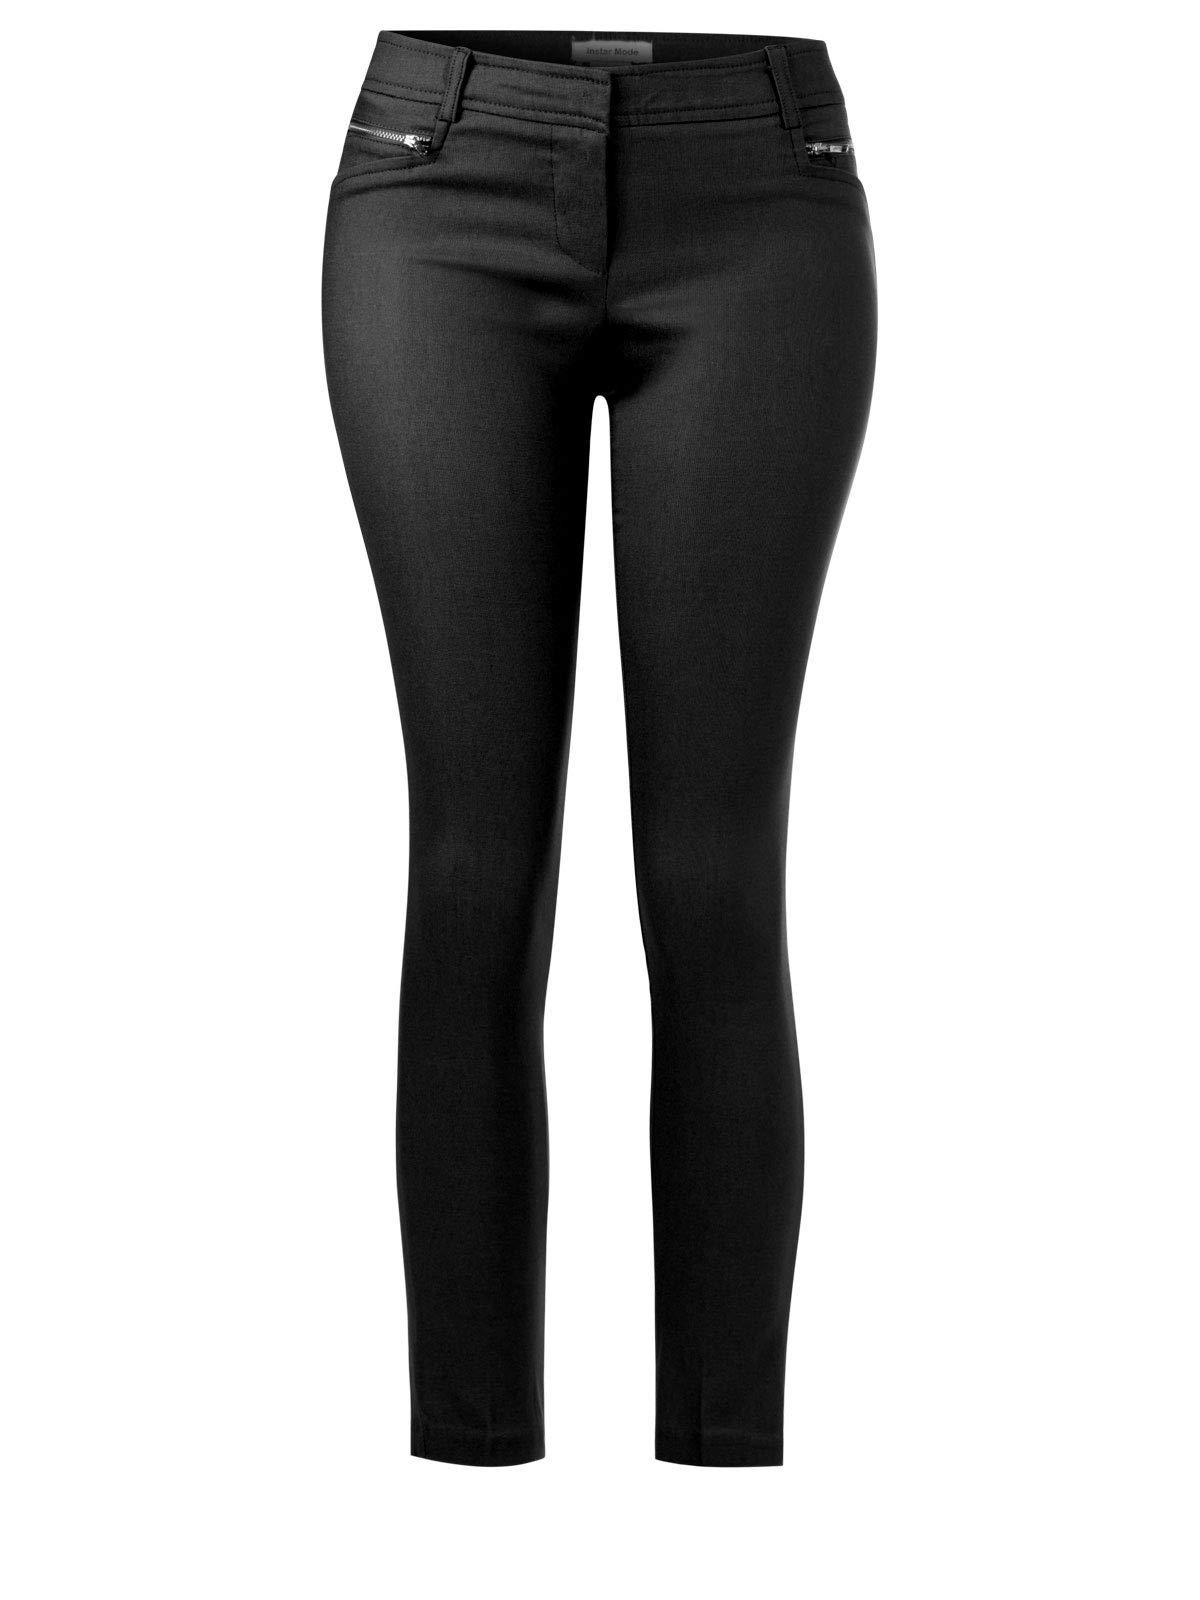 Instar Mode Women's Solid Full Length Formal Pants Black 2XL